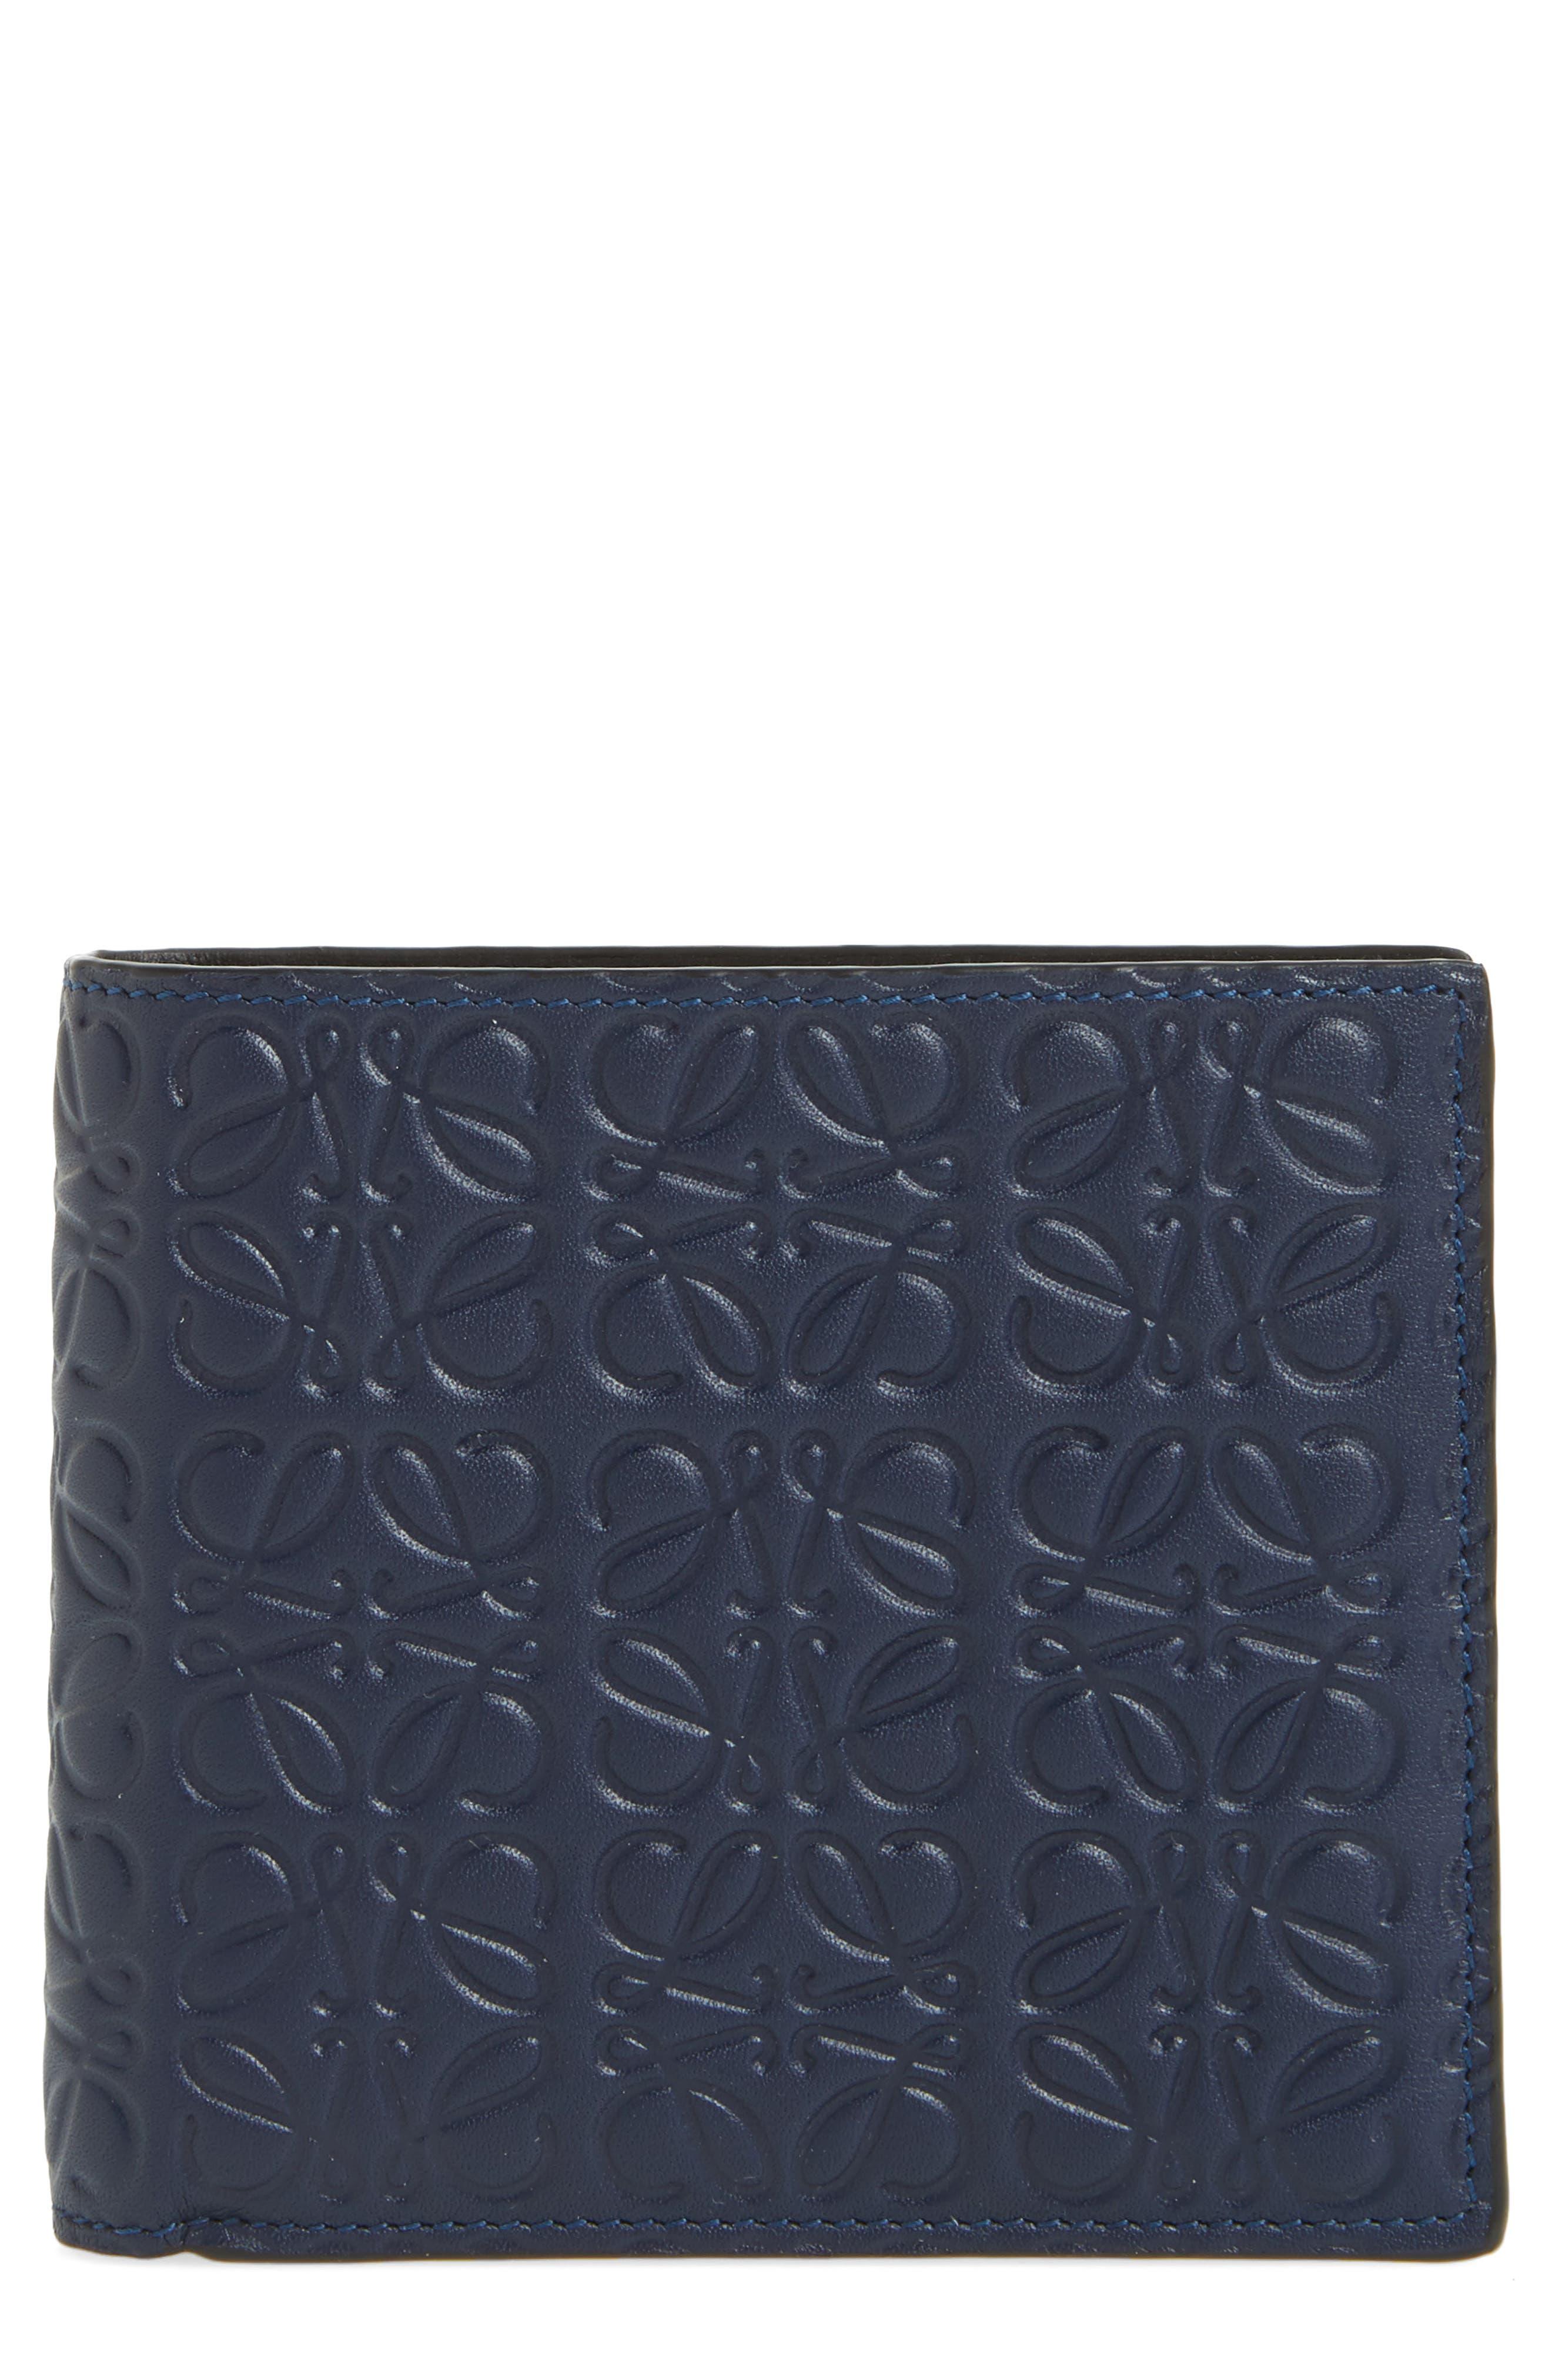 Main Image - Loewe Bifold Leather Wallet